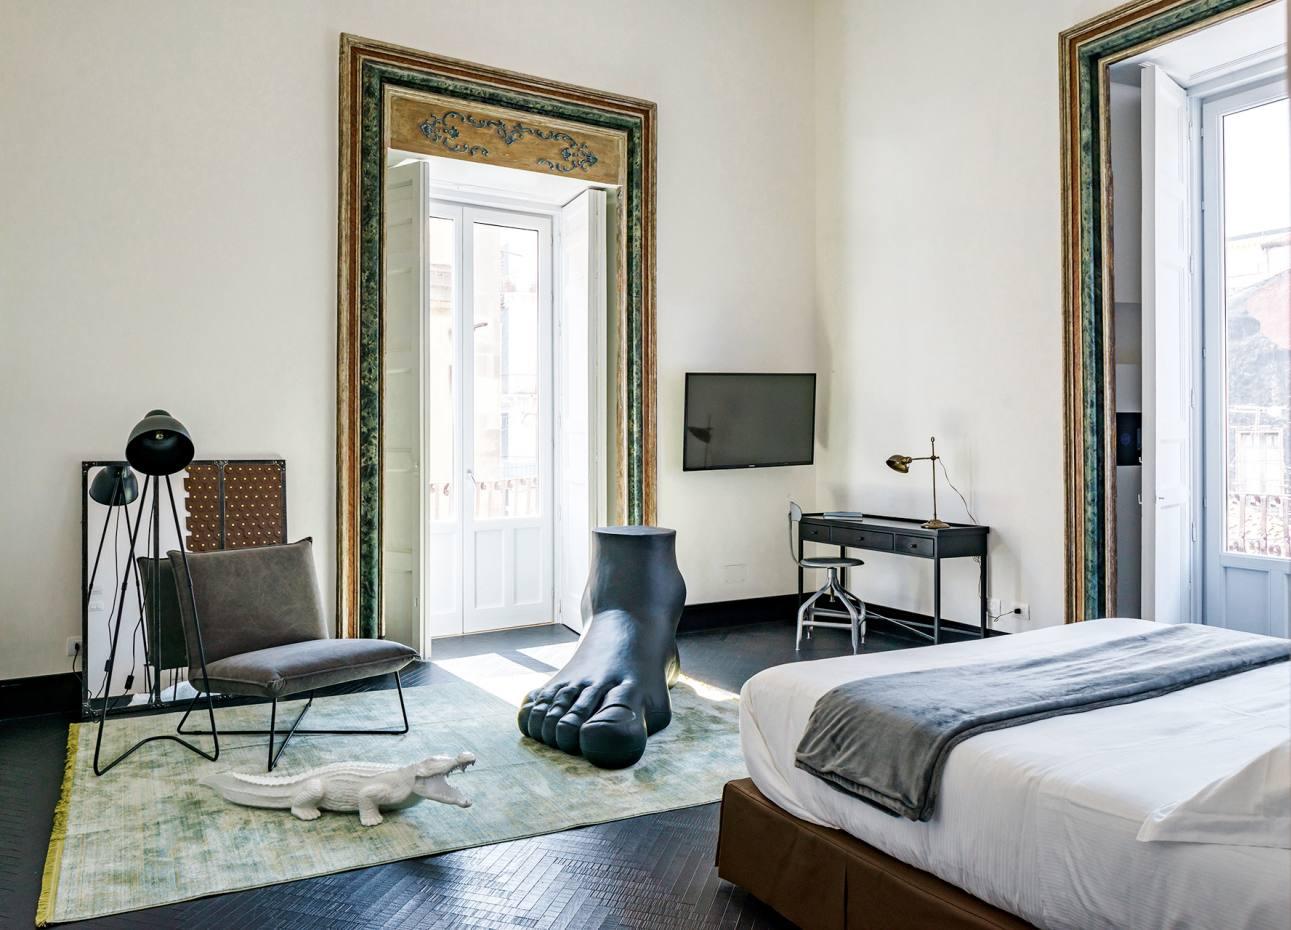 The rooms at Asmundo diGisira, in Catania, each boast bespoke details, such as originalartworks